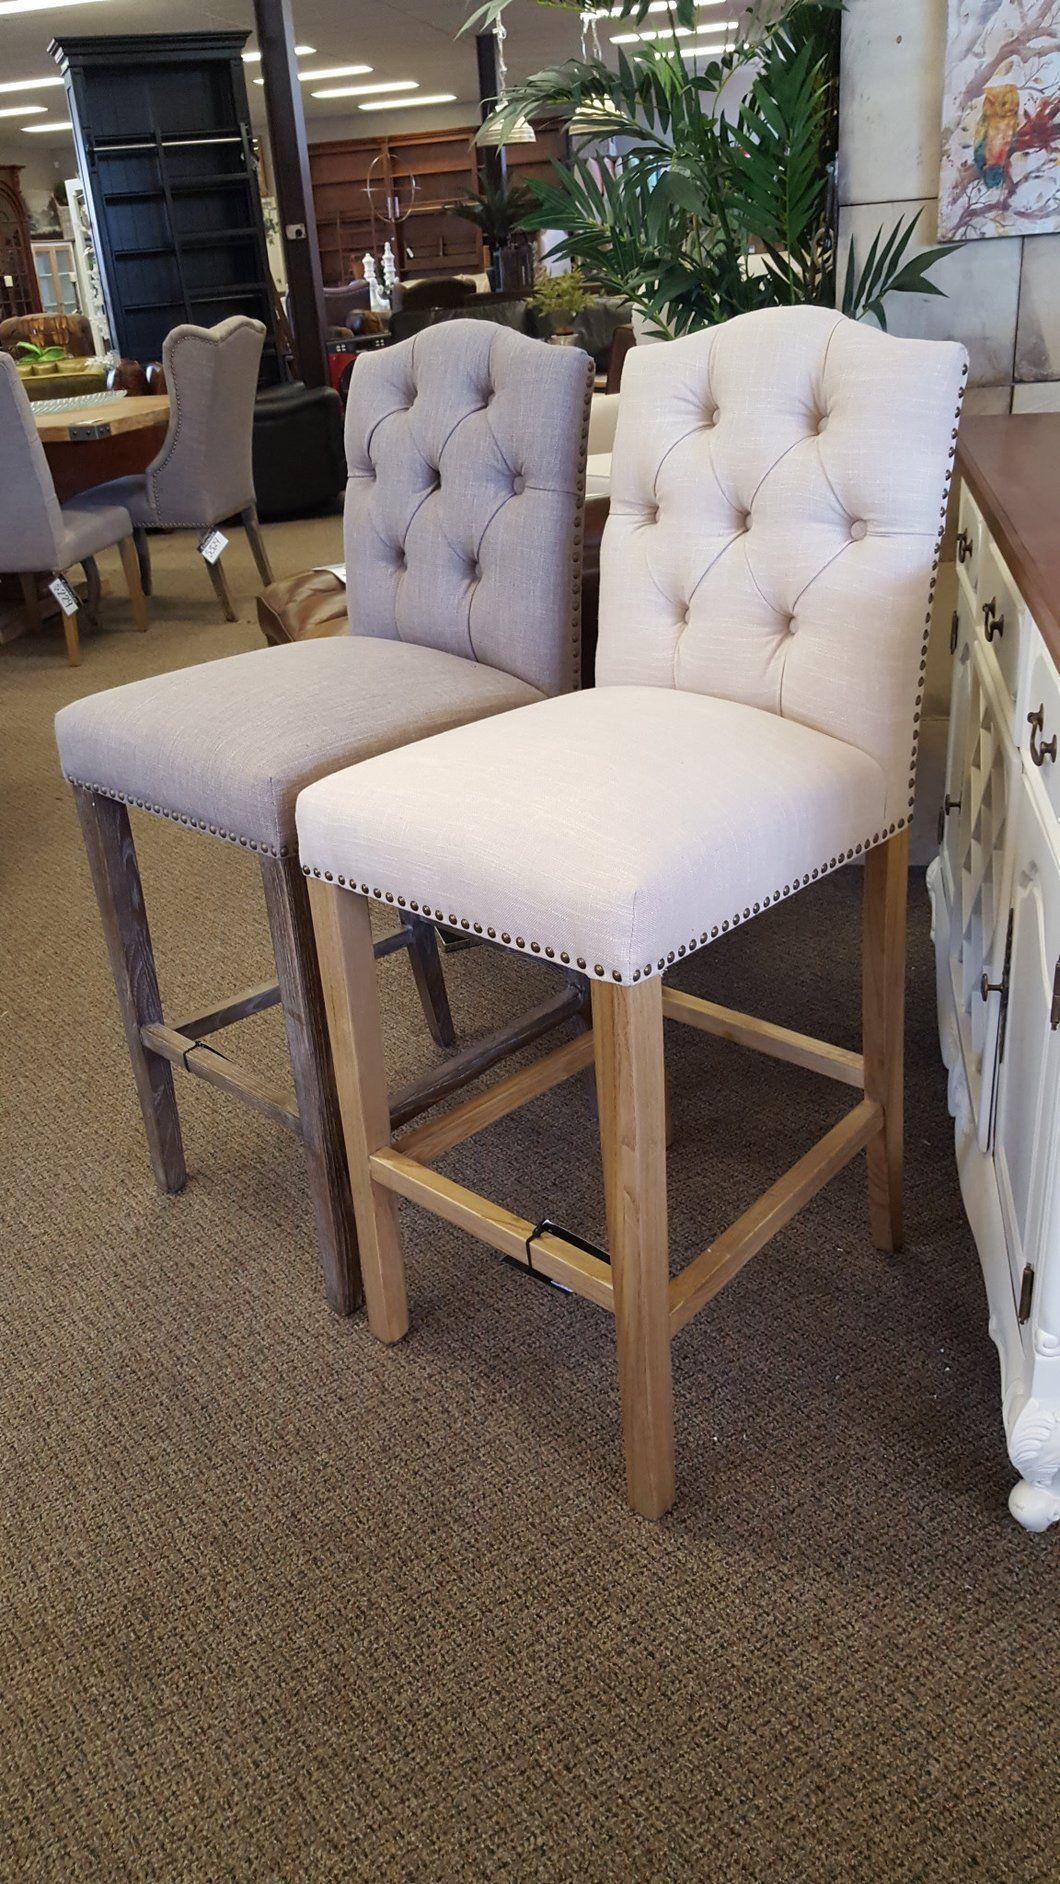 Tufted bar stools Furniture building Pinterest